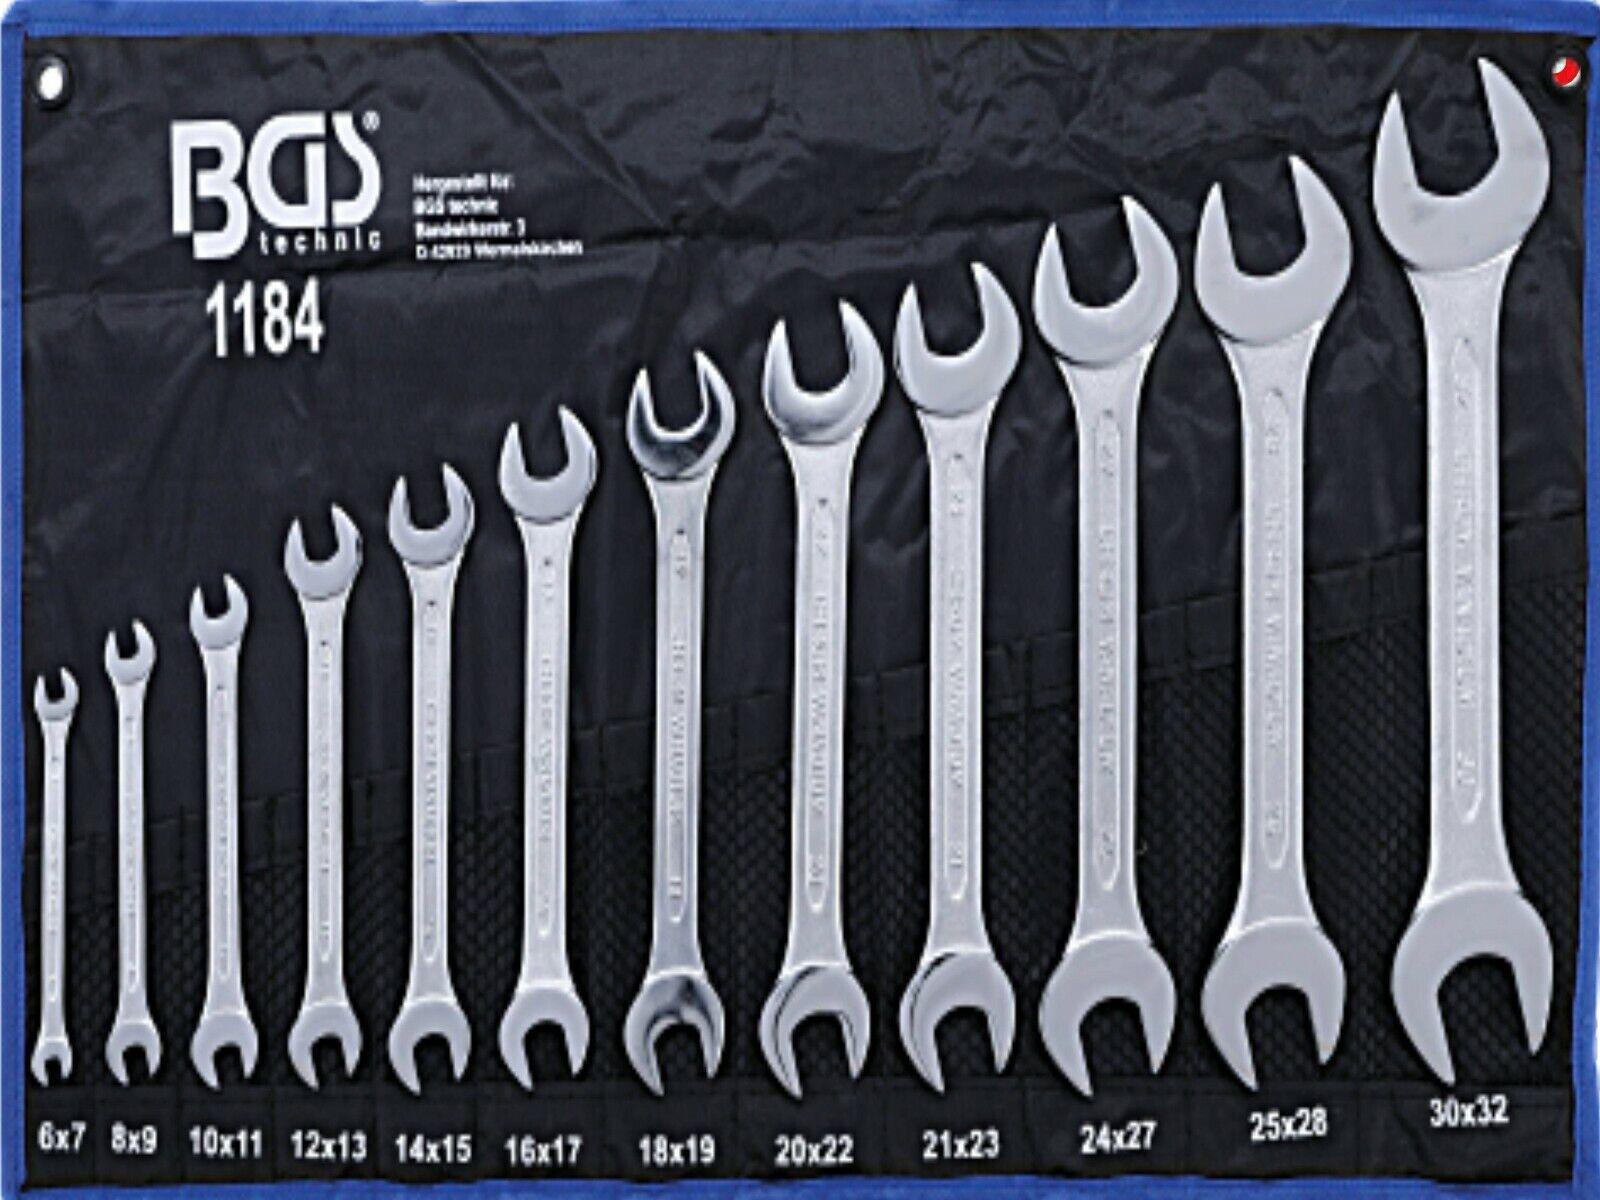 BGS 12-tlg Satz Doppel Maulschlüssel DIN3110 Doppelmaulschlüssel Gabelschlüssel